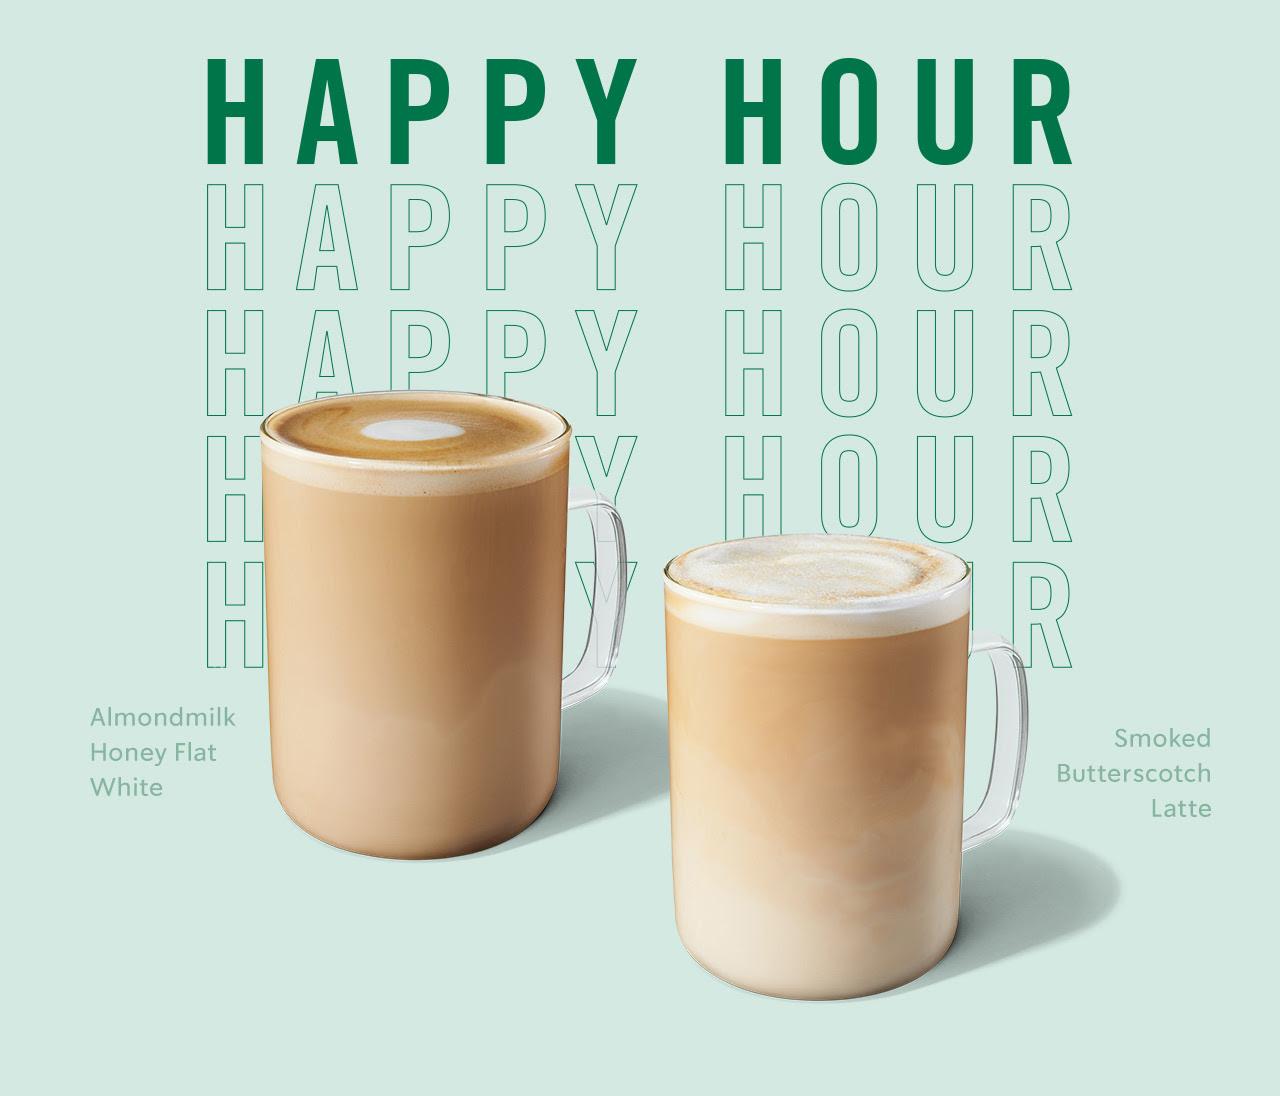 Starbucks Stores: Any Handcrafted Beverage (Grande or Larger)